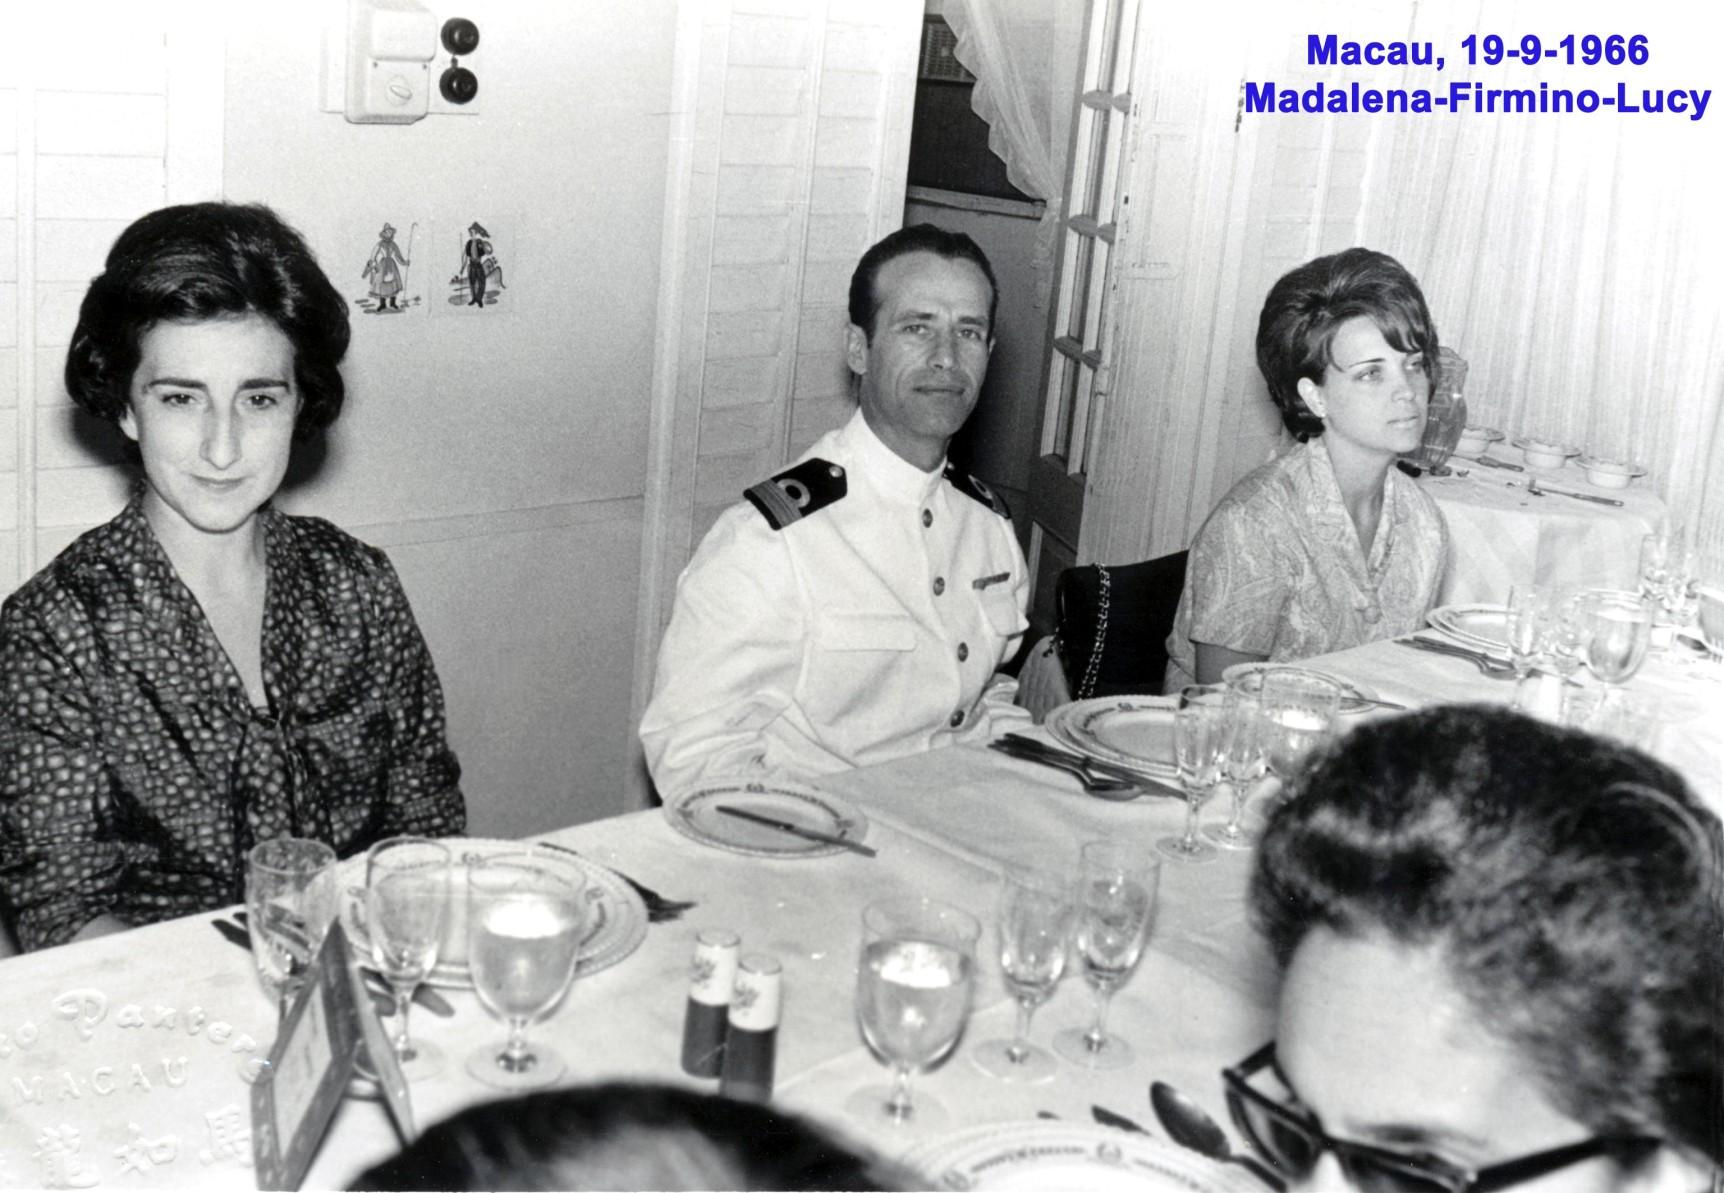 013 66-09-19 no jantar Madalena-Firmino-Lucy